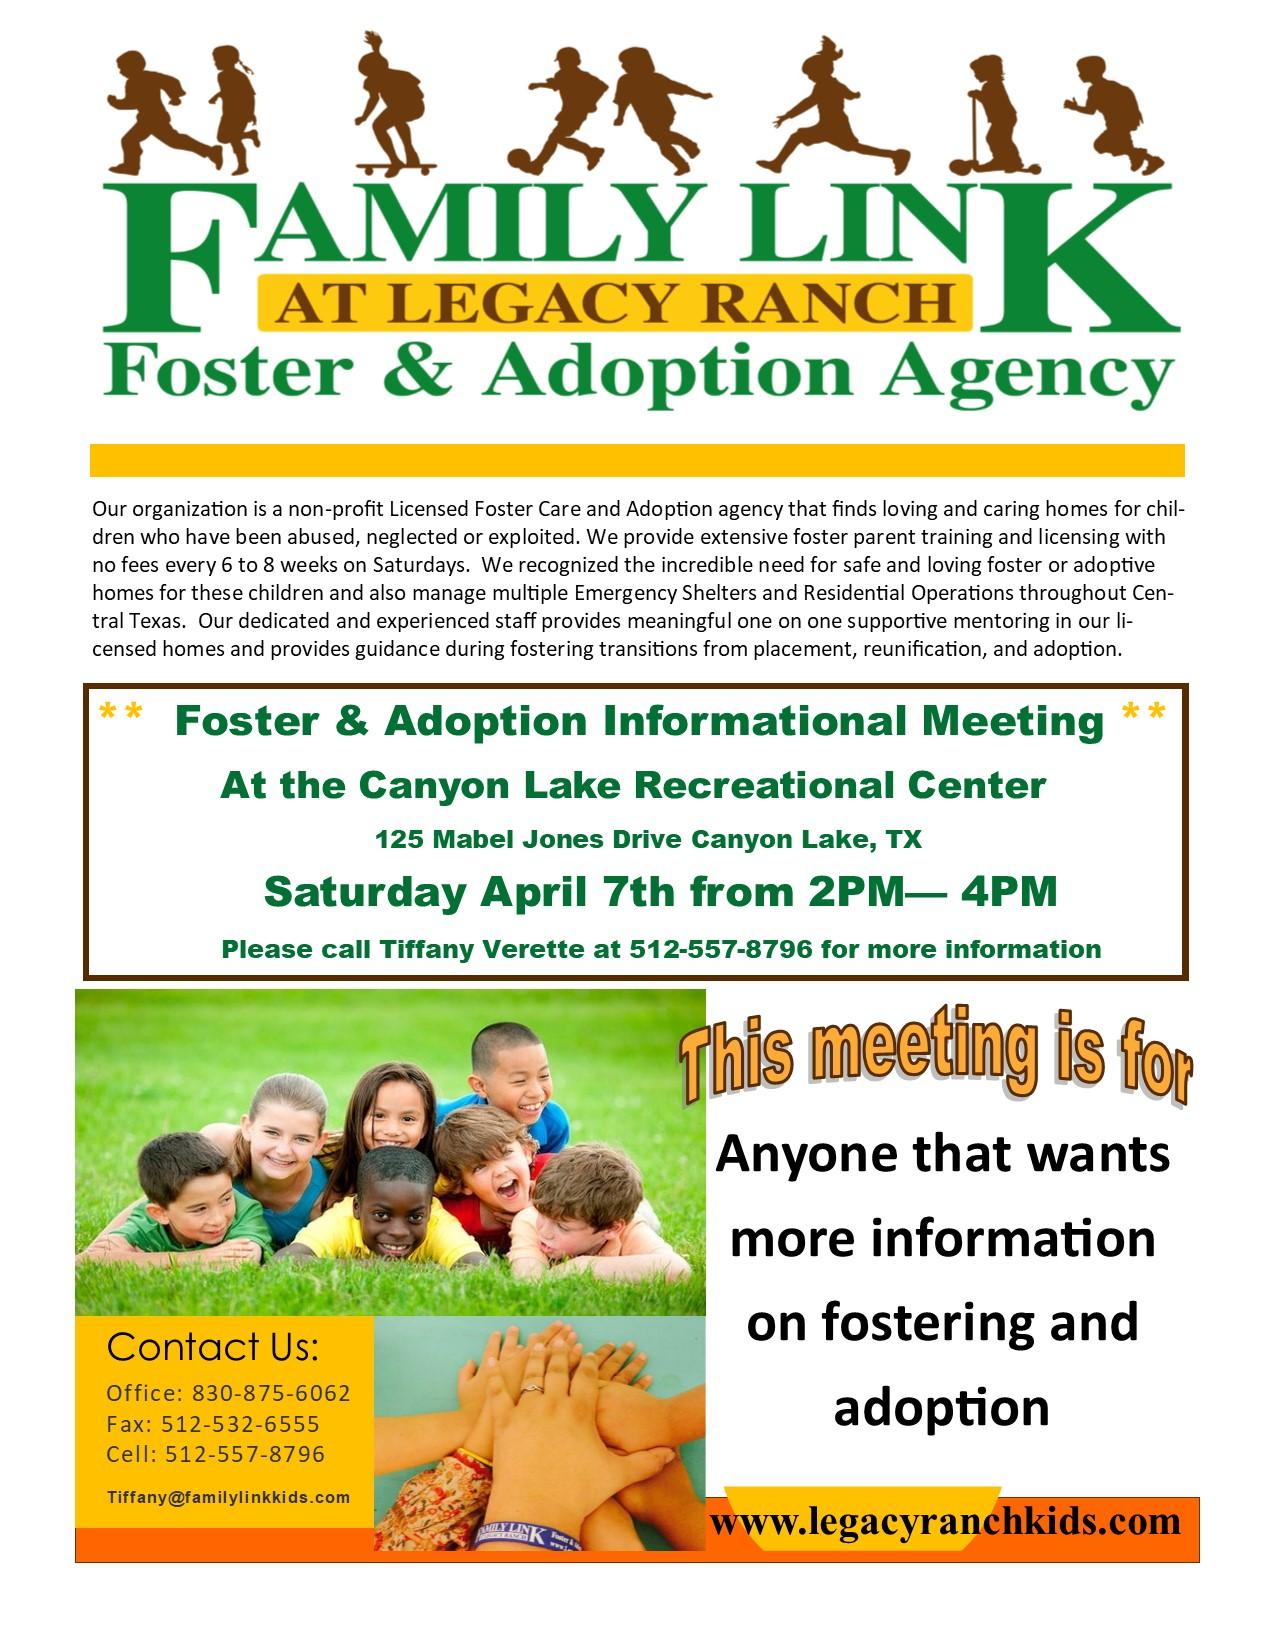 informational flyer familylink kids at legacy ranch